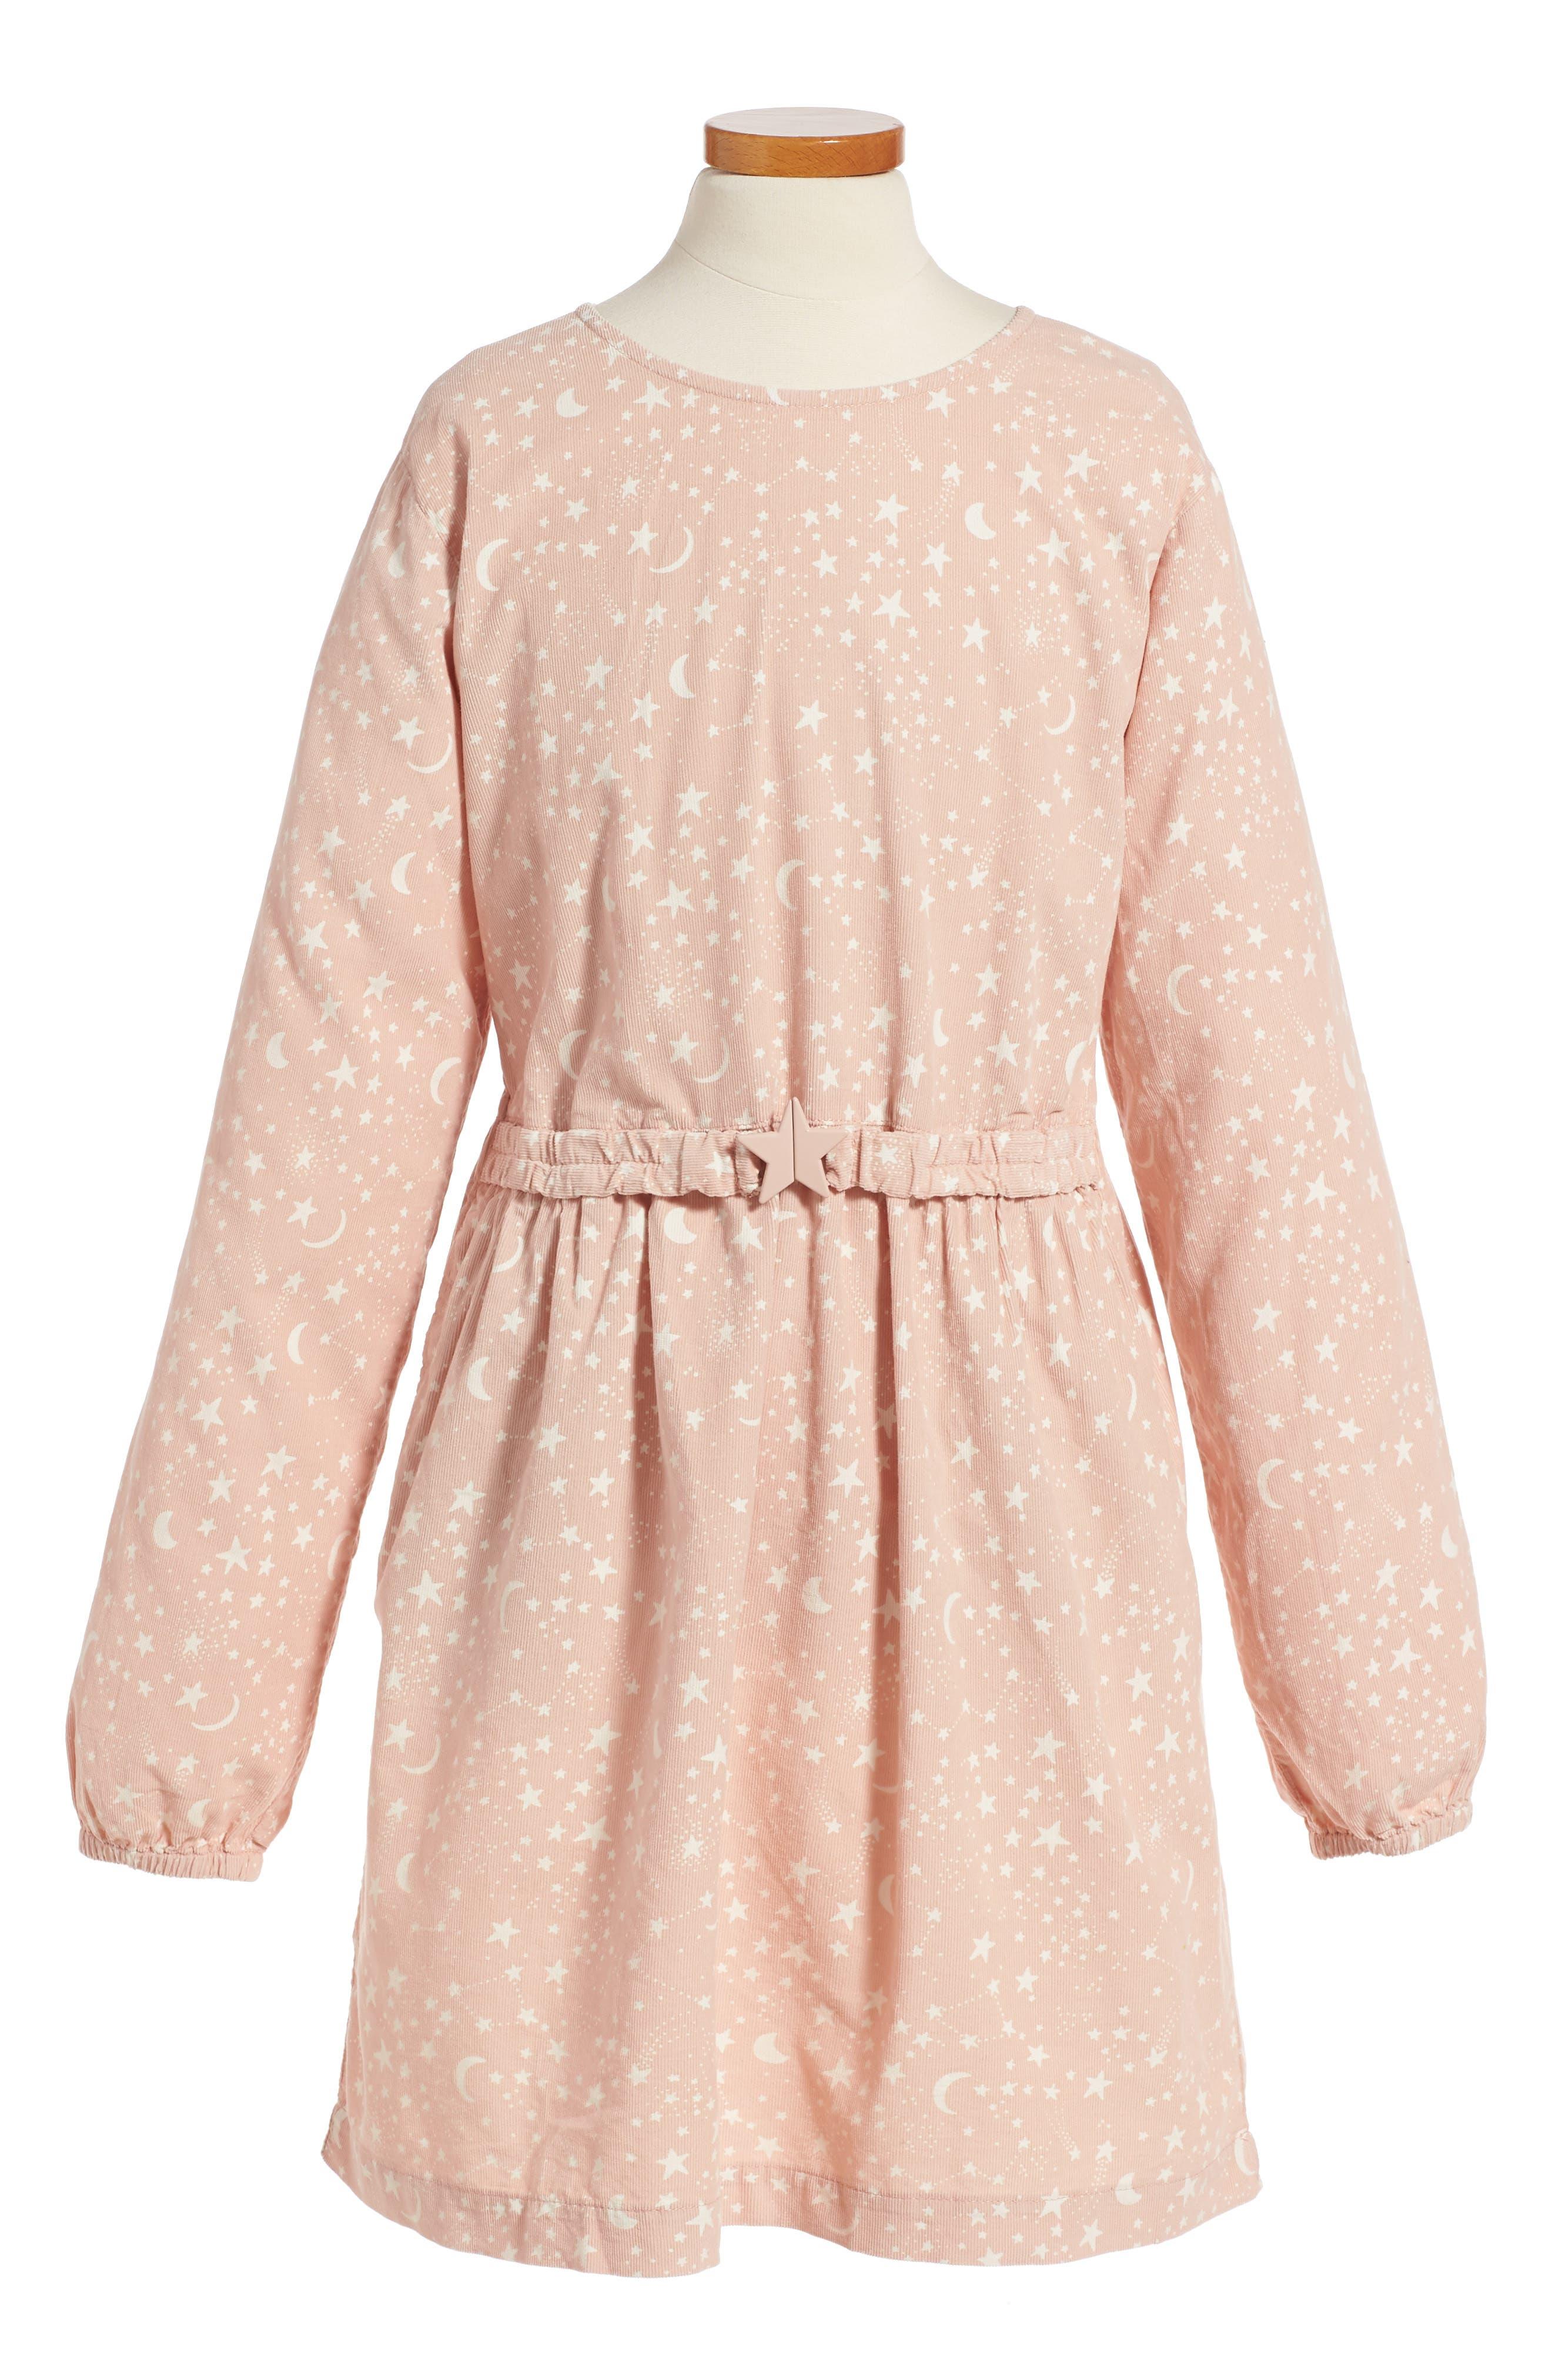 Kids Skippy Star Print Dress,                         Main,                         color, 650